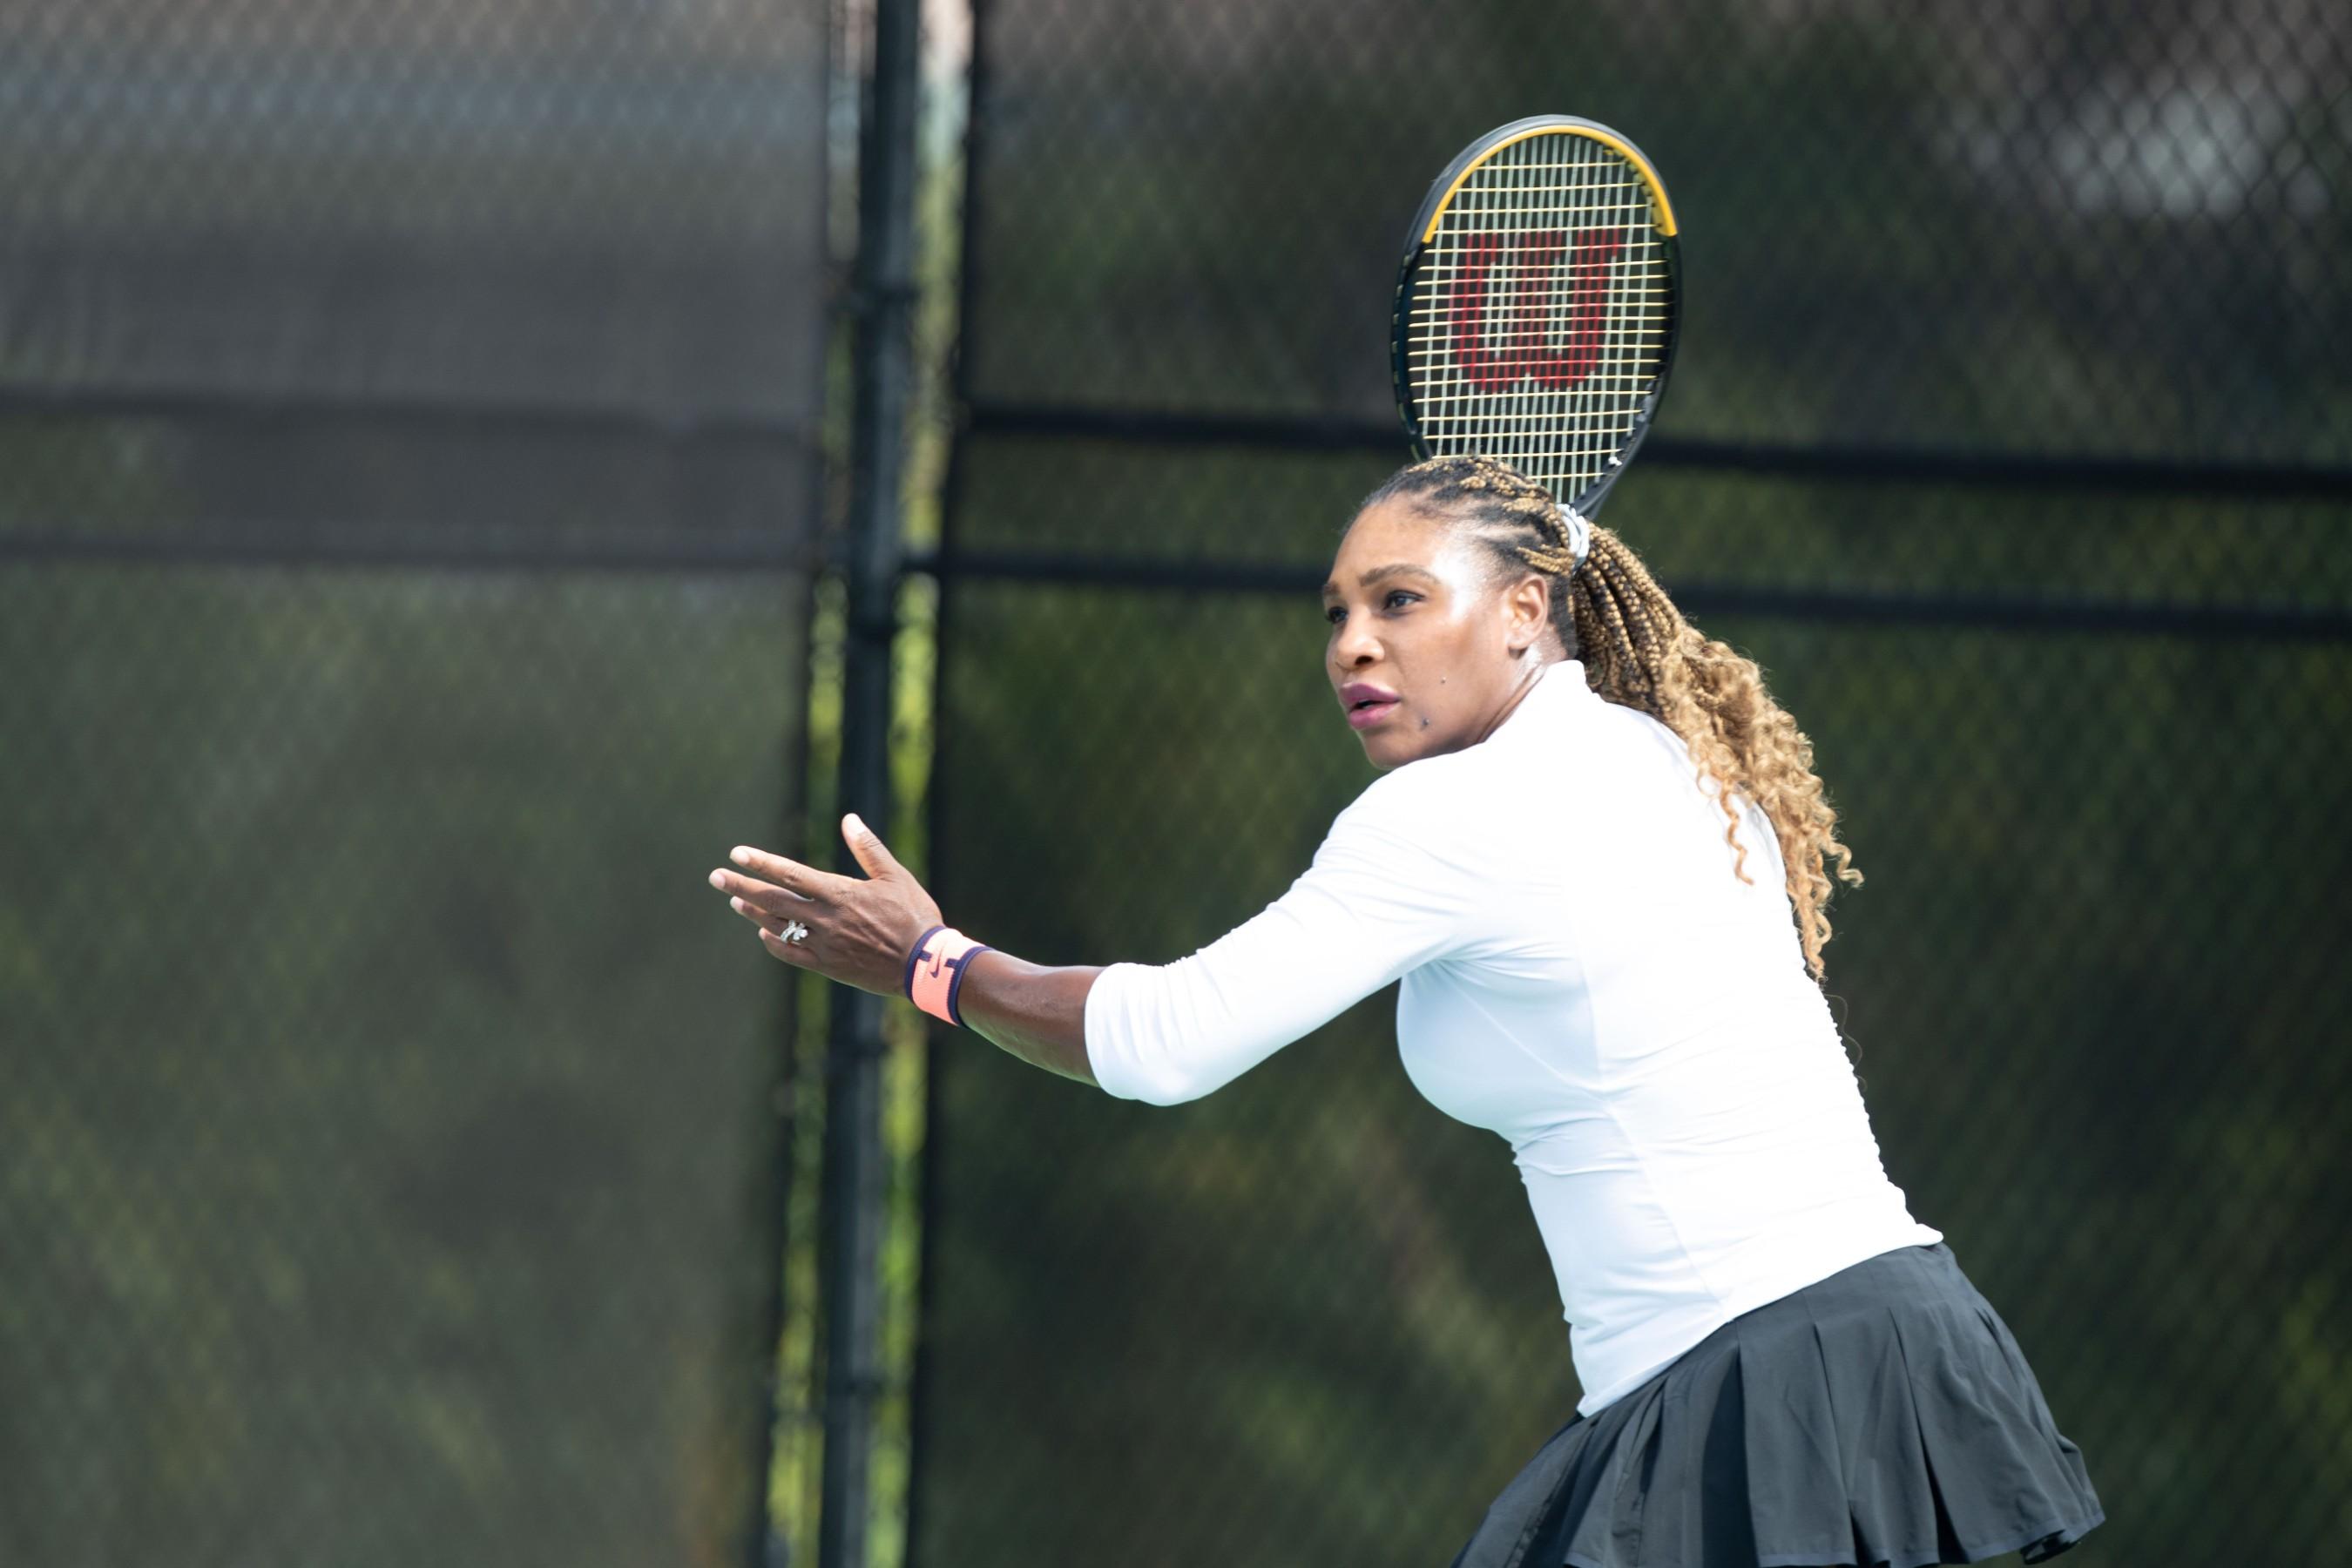 Abbvie Serves Up Grand Slam Tennis Champion Serena Williams As New Ubrelvy Spokesperson Fiercepharma